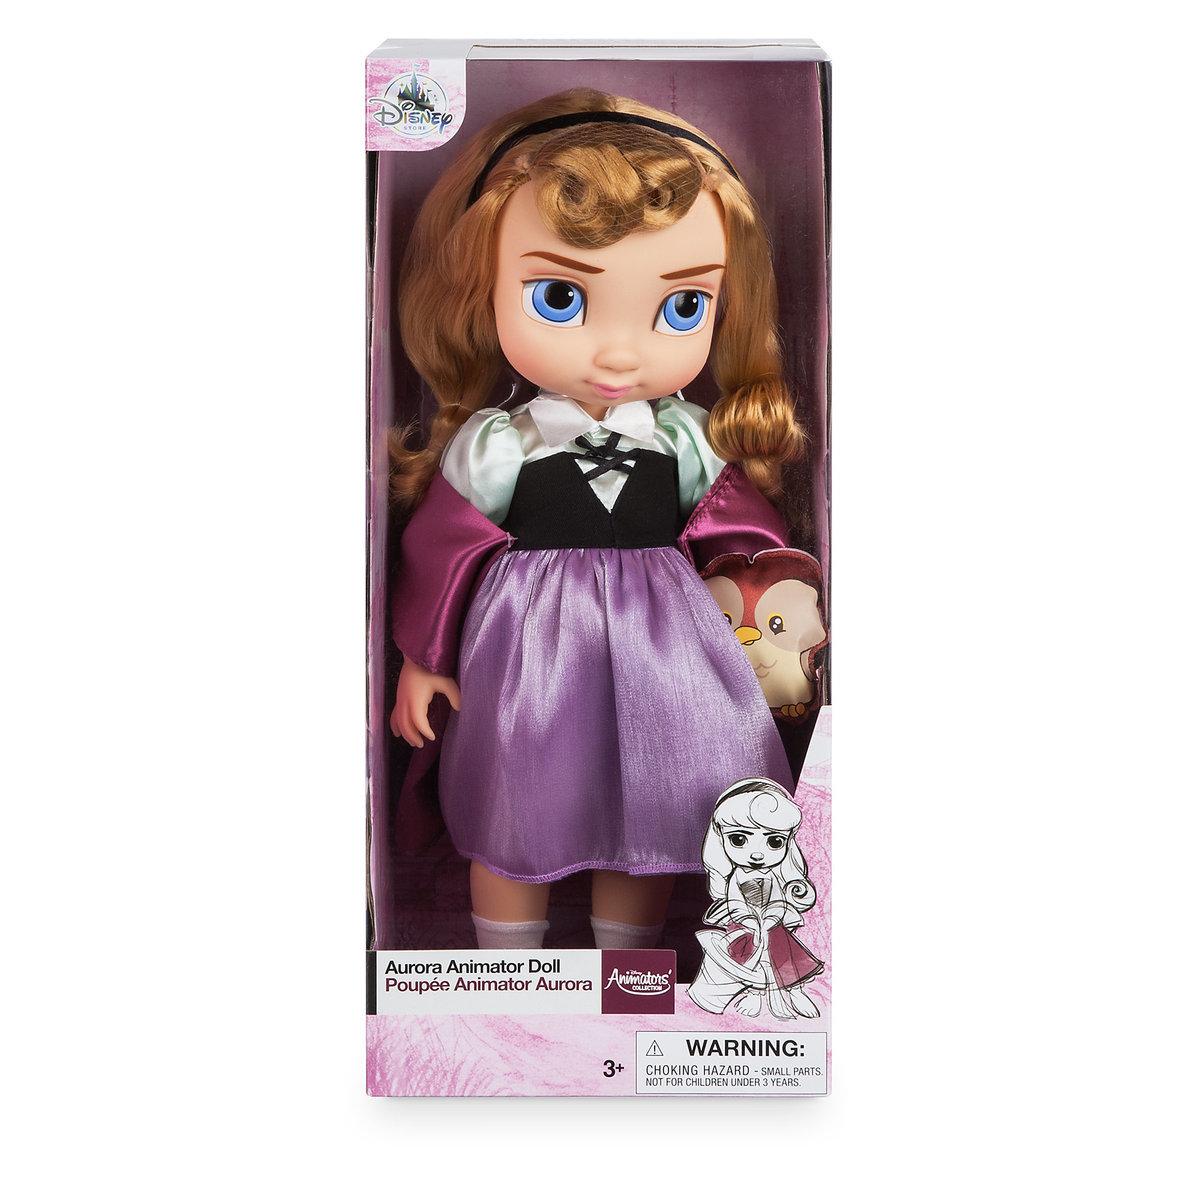 Disney Animators' Collection Aurora Doll - 16'' ของแท้ นำเข้าจากอเมริกา